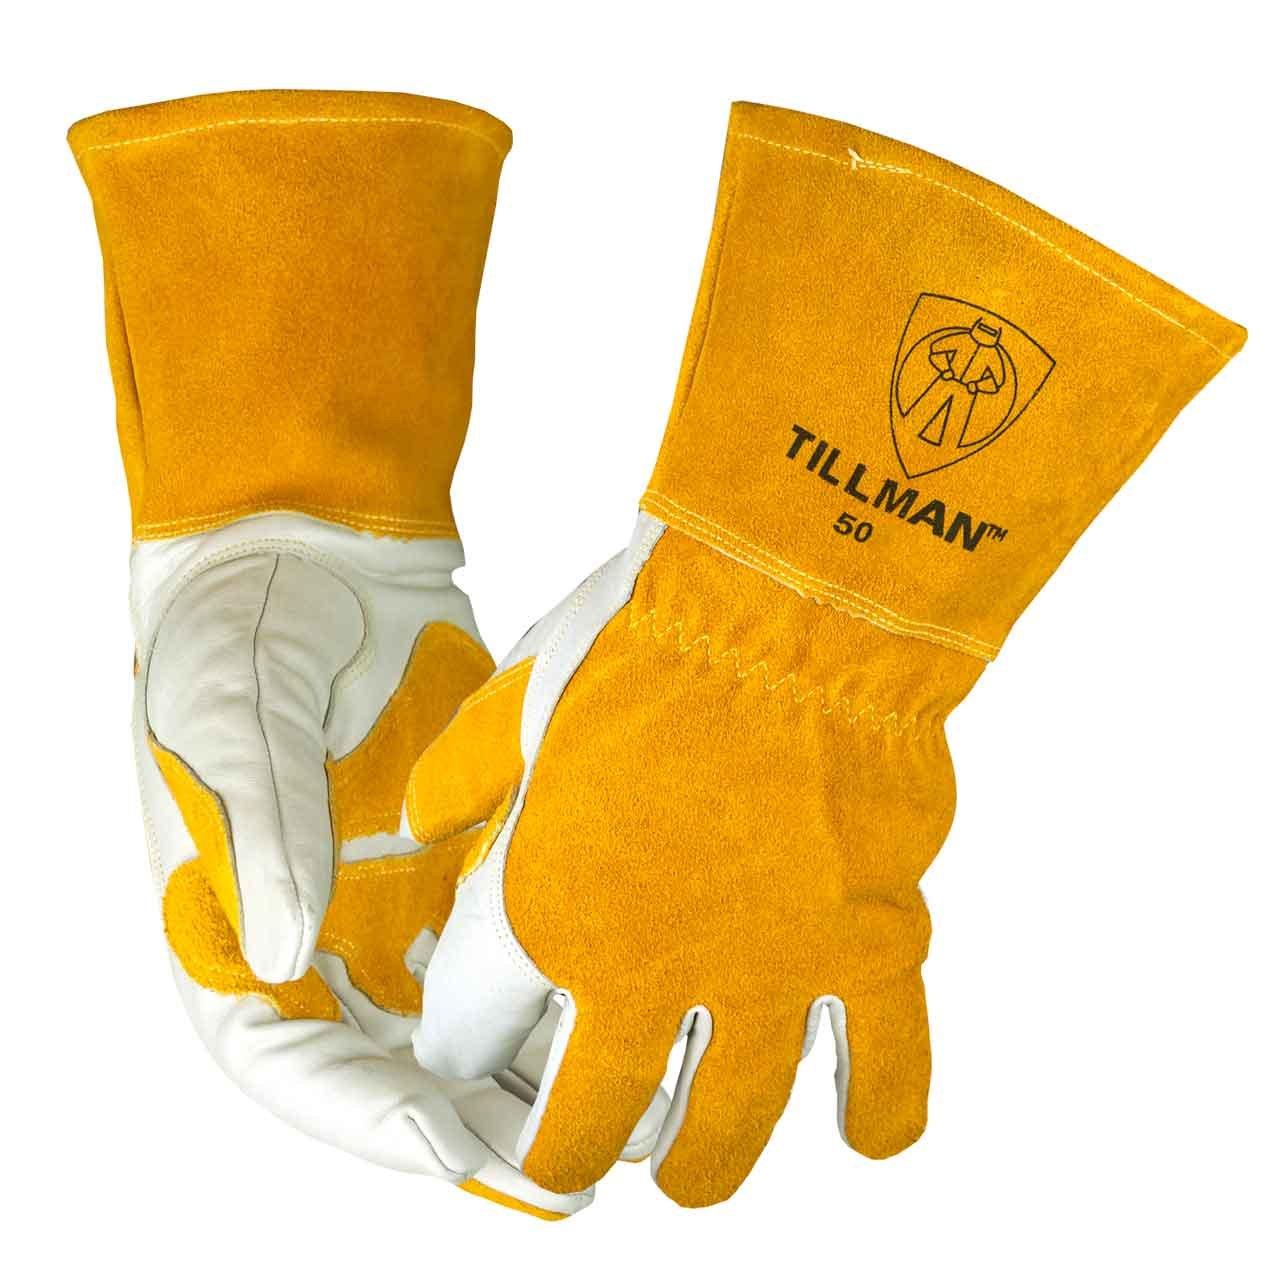 Tillman 50 Top Grain Split Cowhide Fleece Lined MIG Welding Gloves, Sm